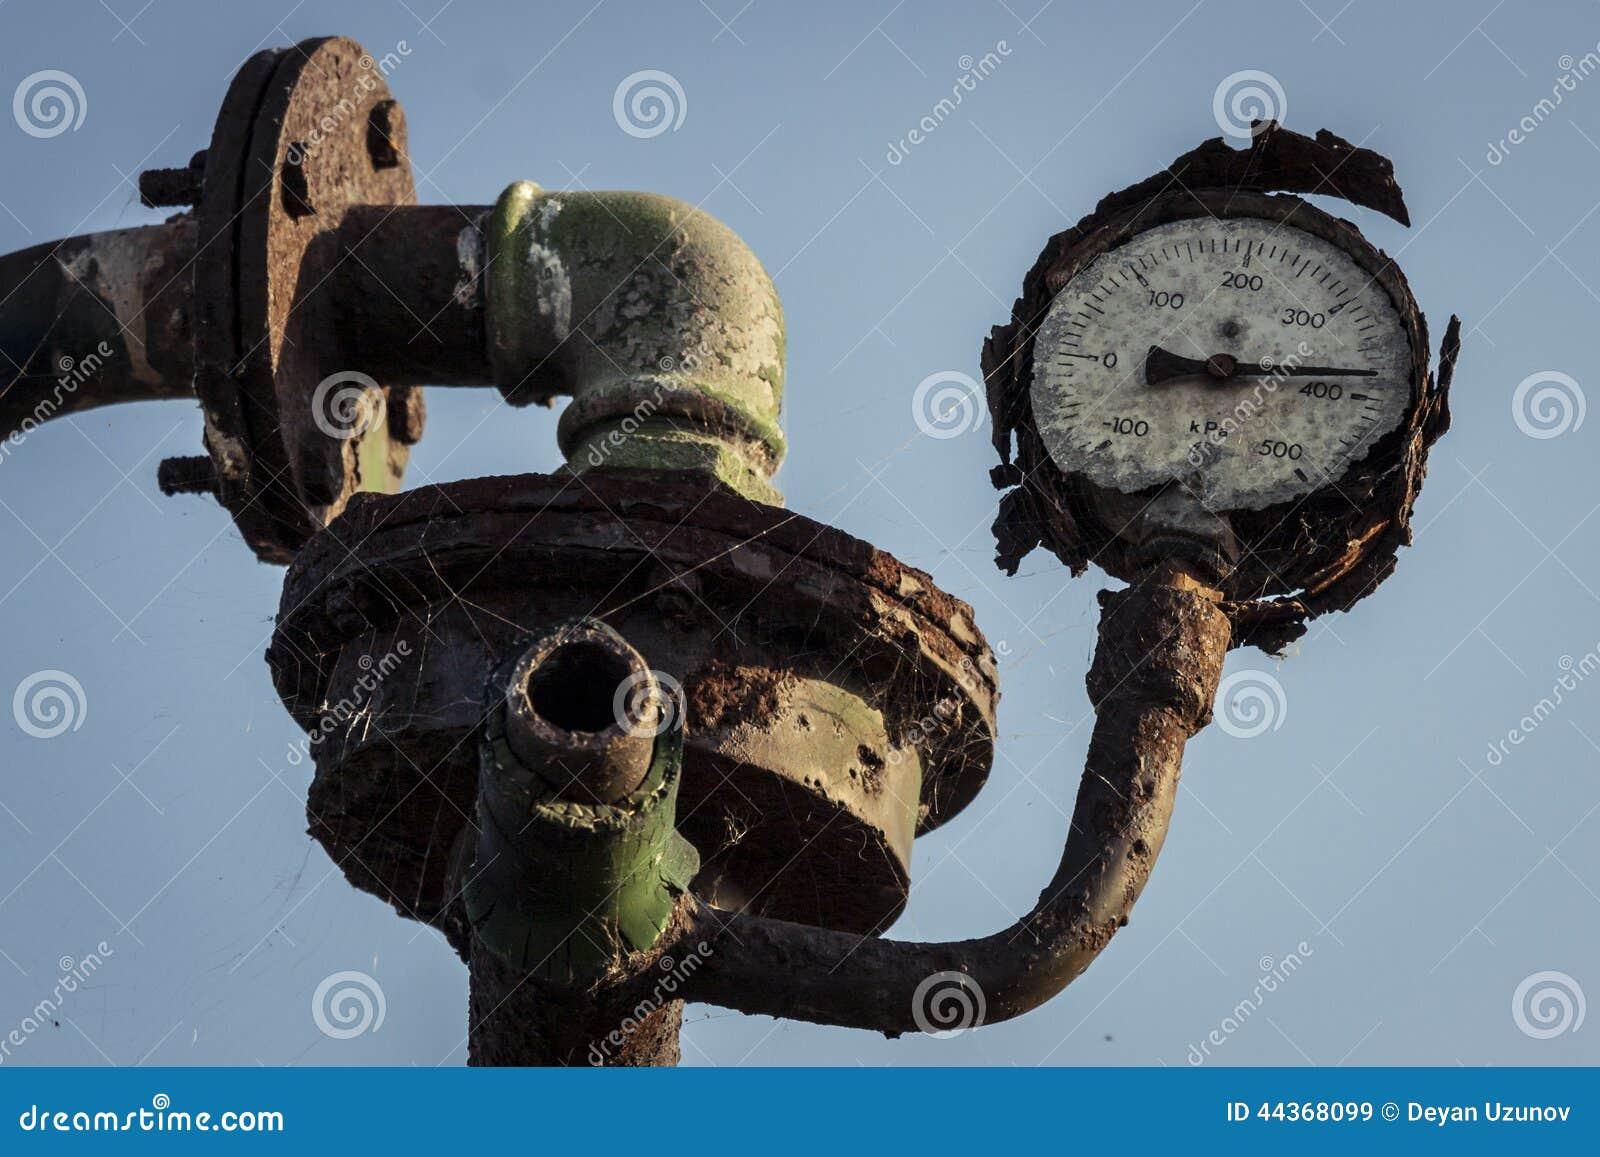 Gamla inte funktionsdugliga Rusty Pressure Gauge